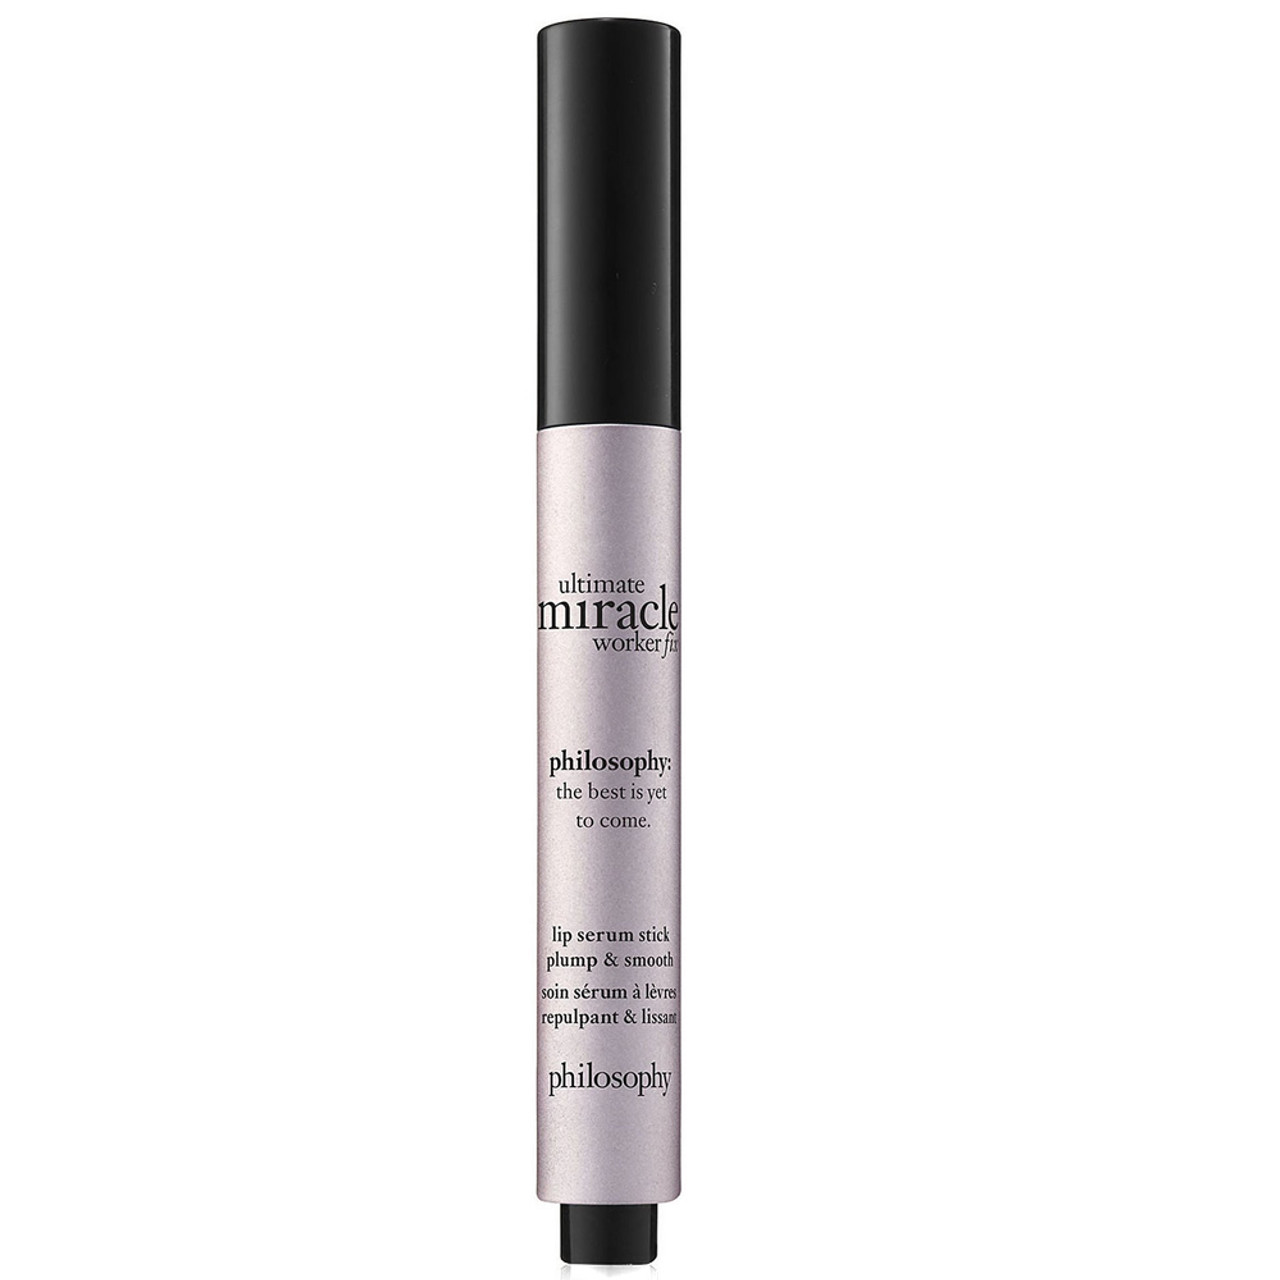 philosophy Ultimate Miracle Worker Lip Fix Serum Stick